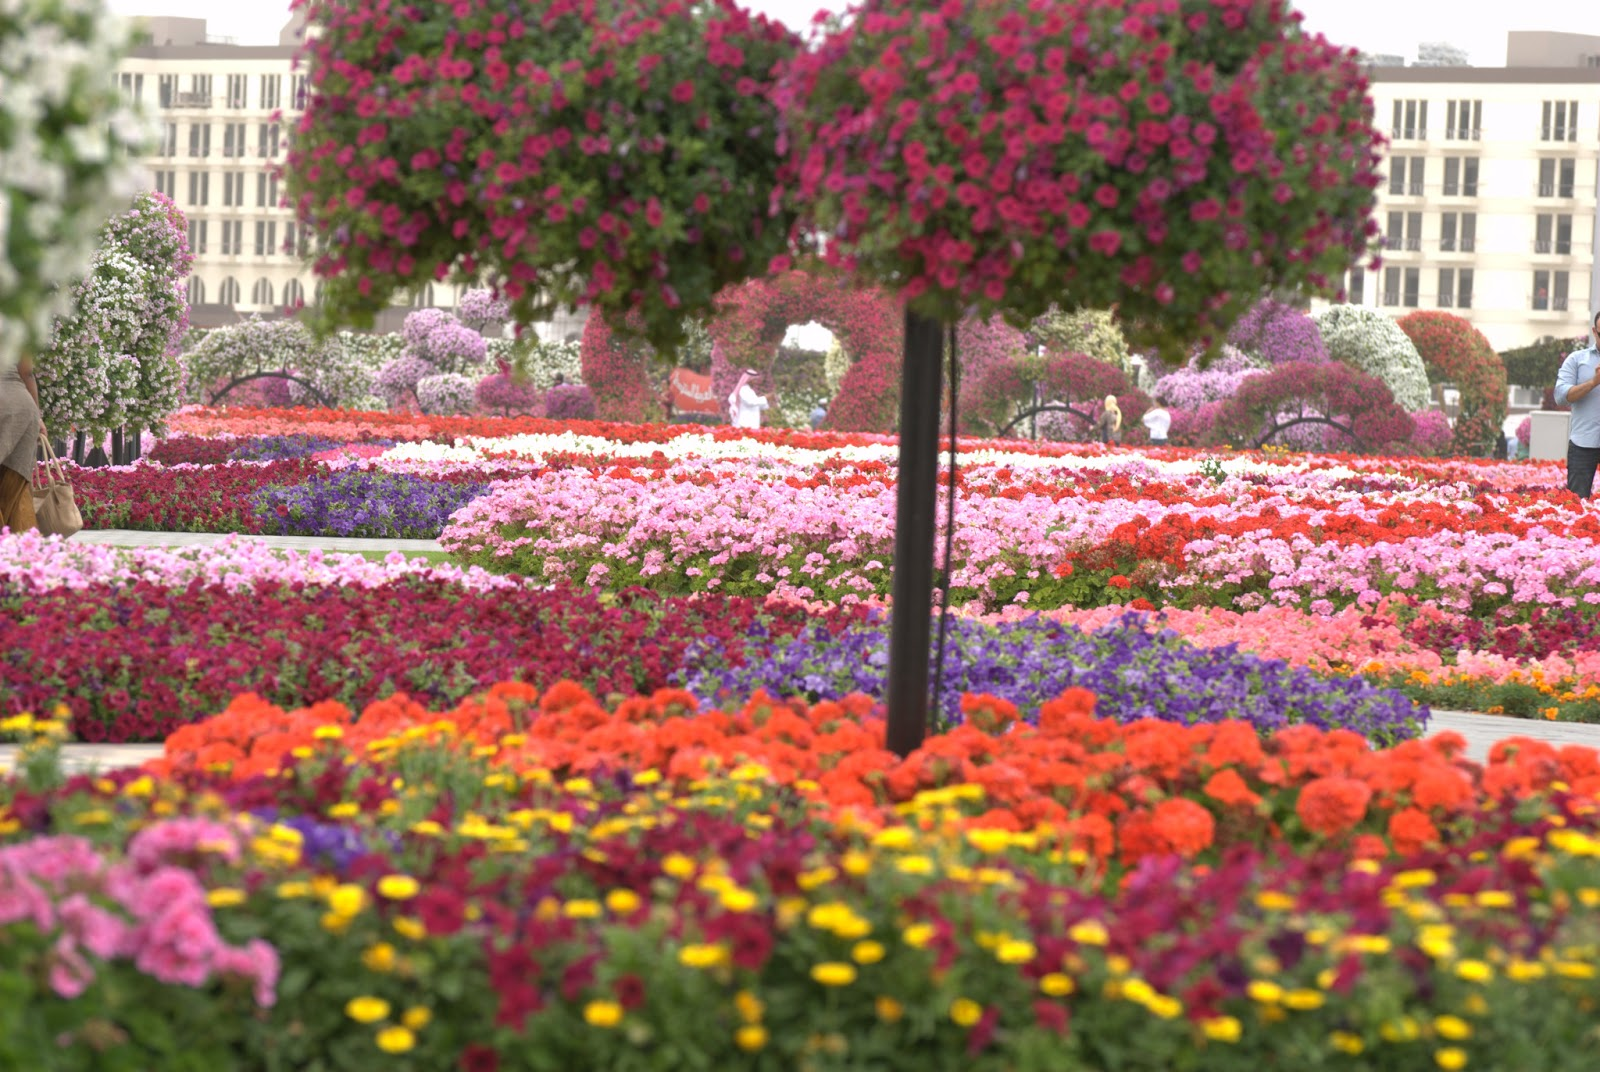 a day in miracle garden dubai vagish hardooru